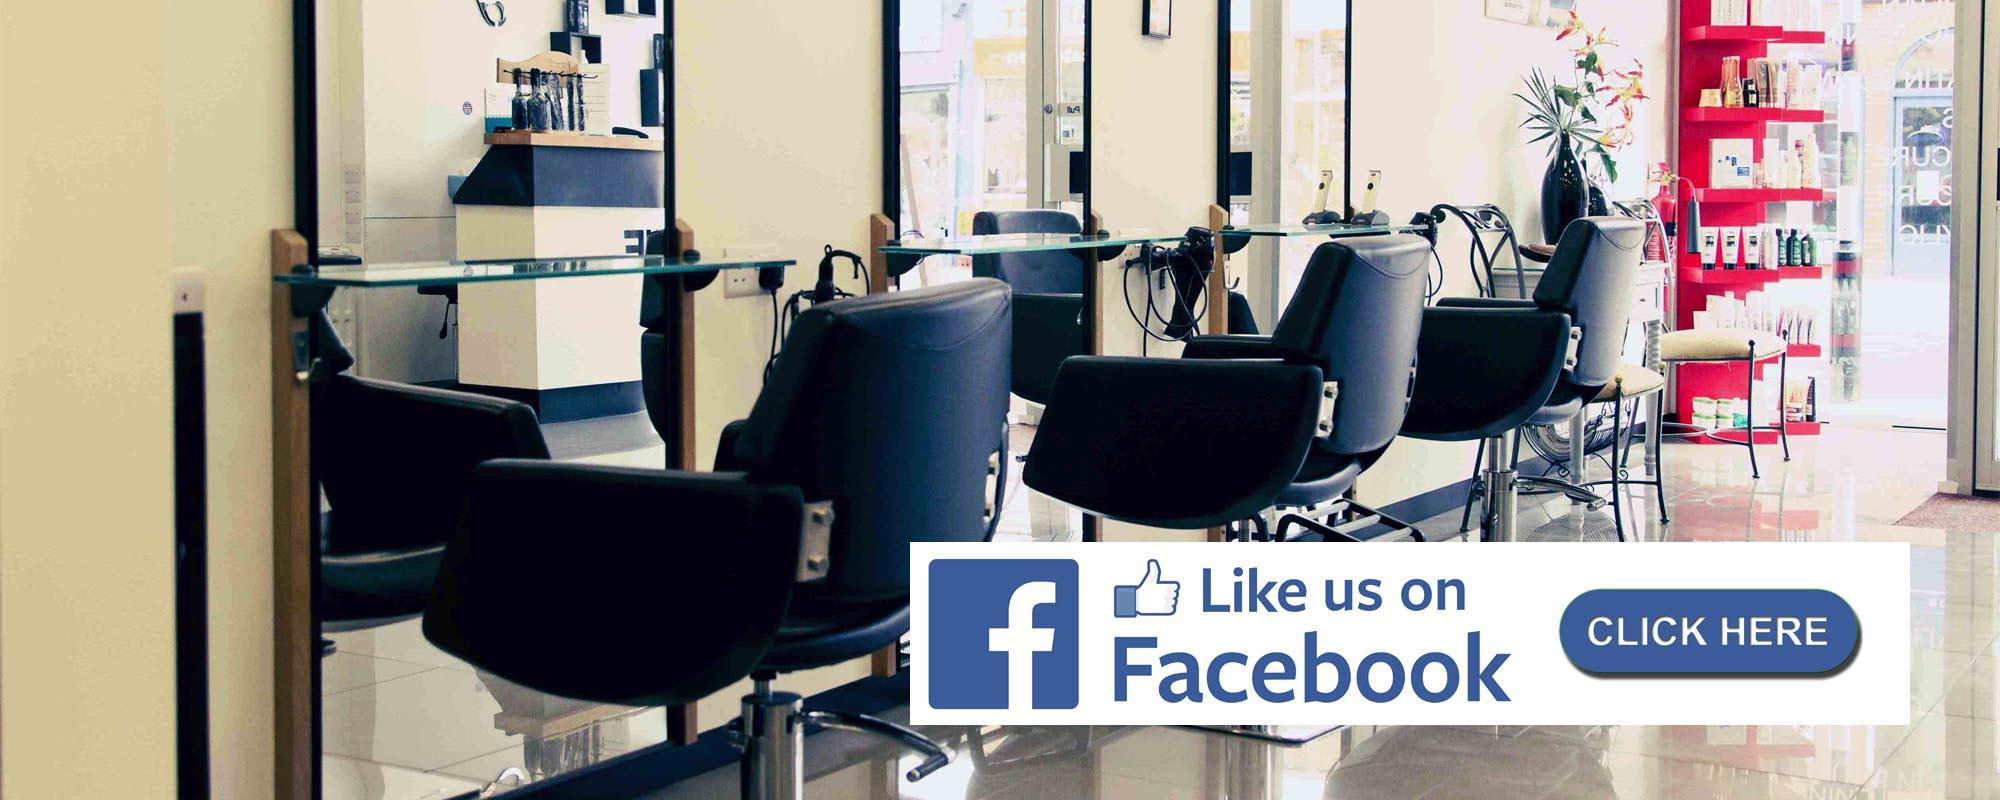 Unique Hair salon like us on facebook